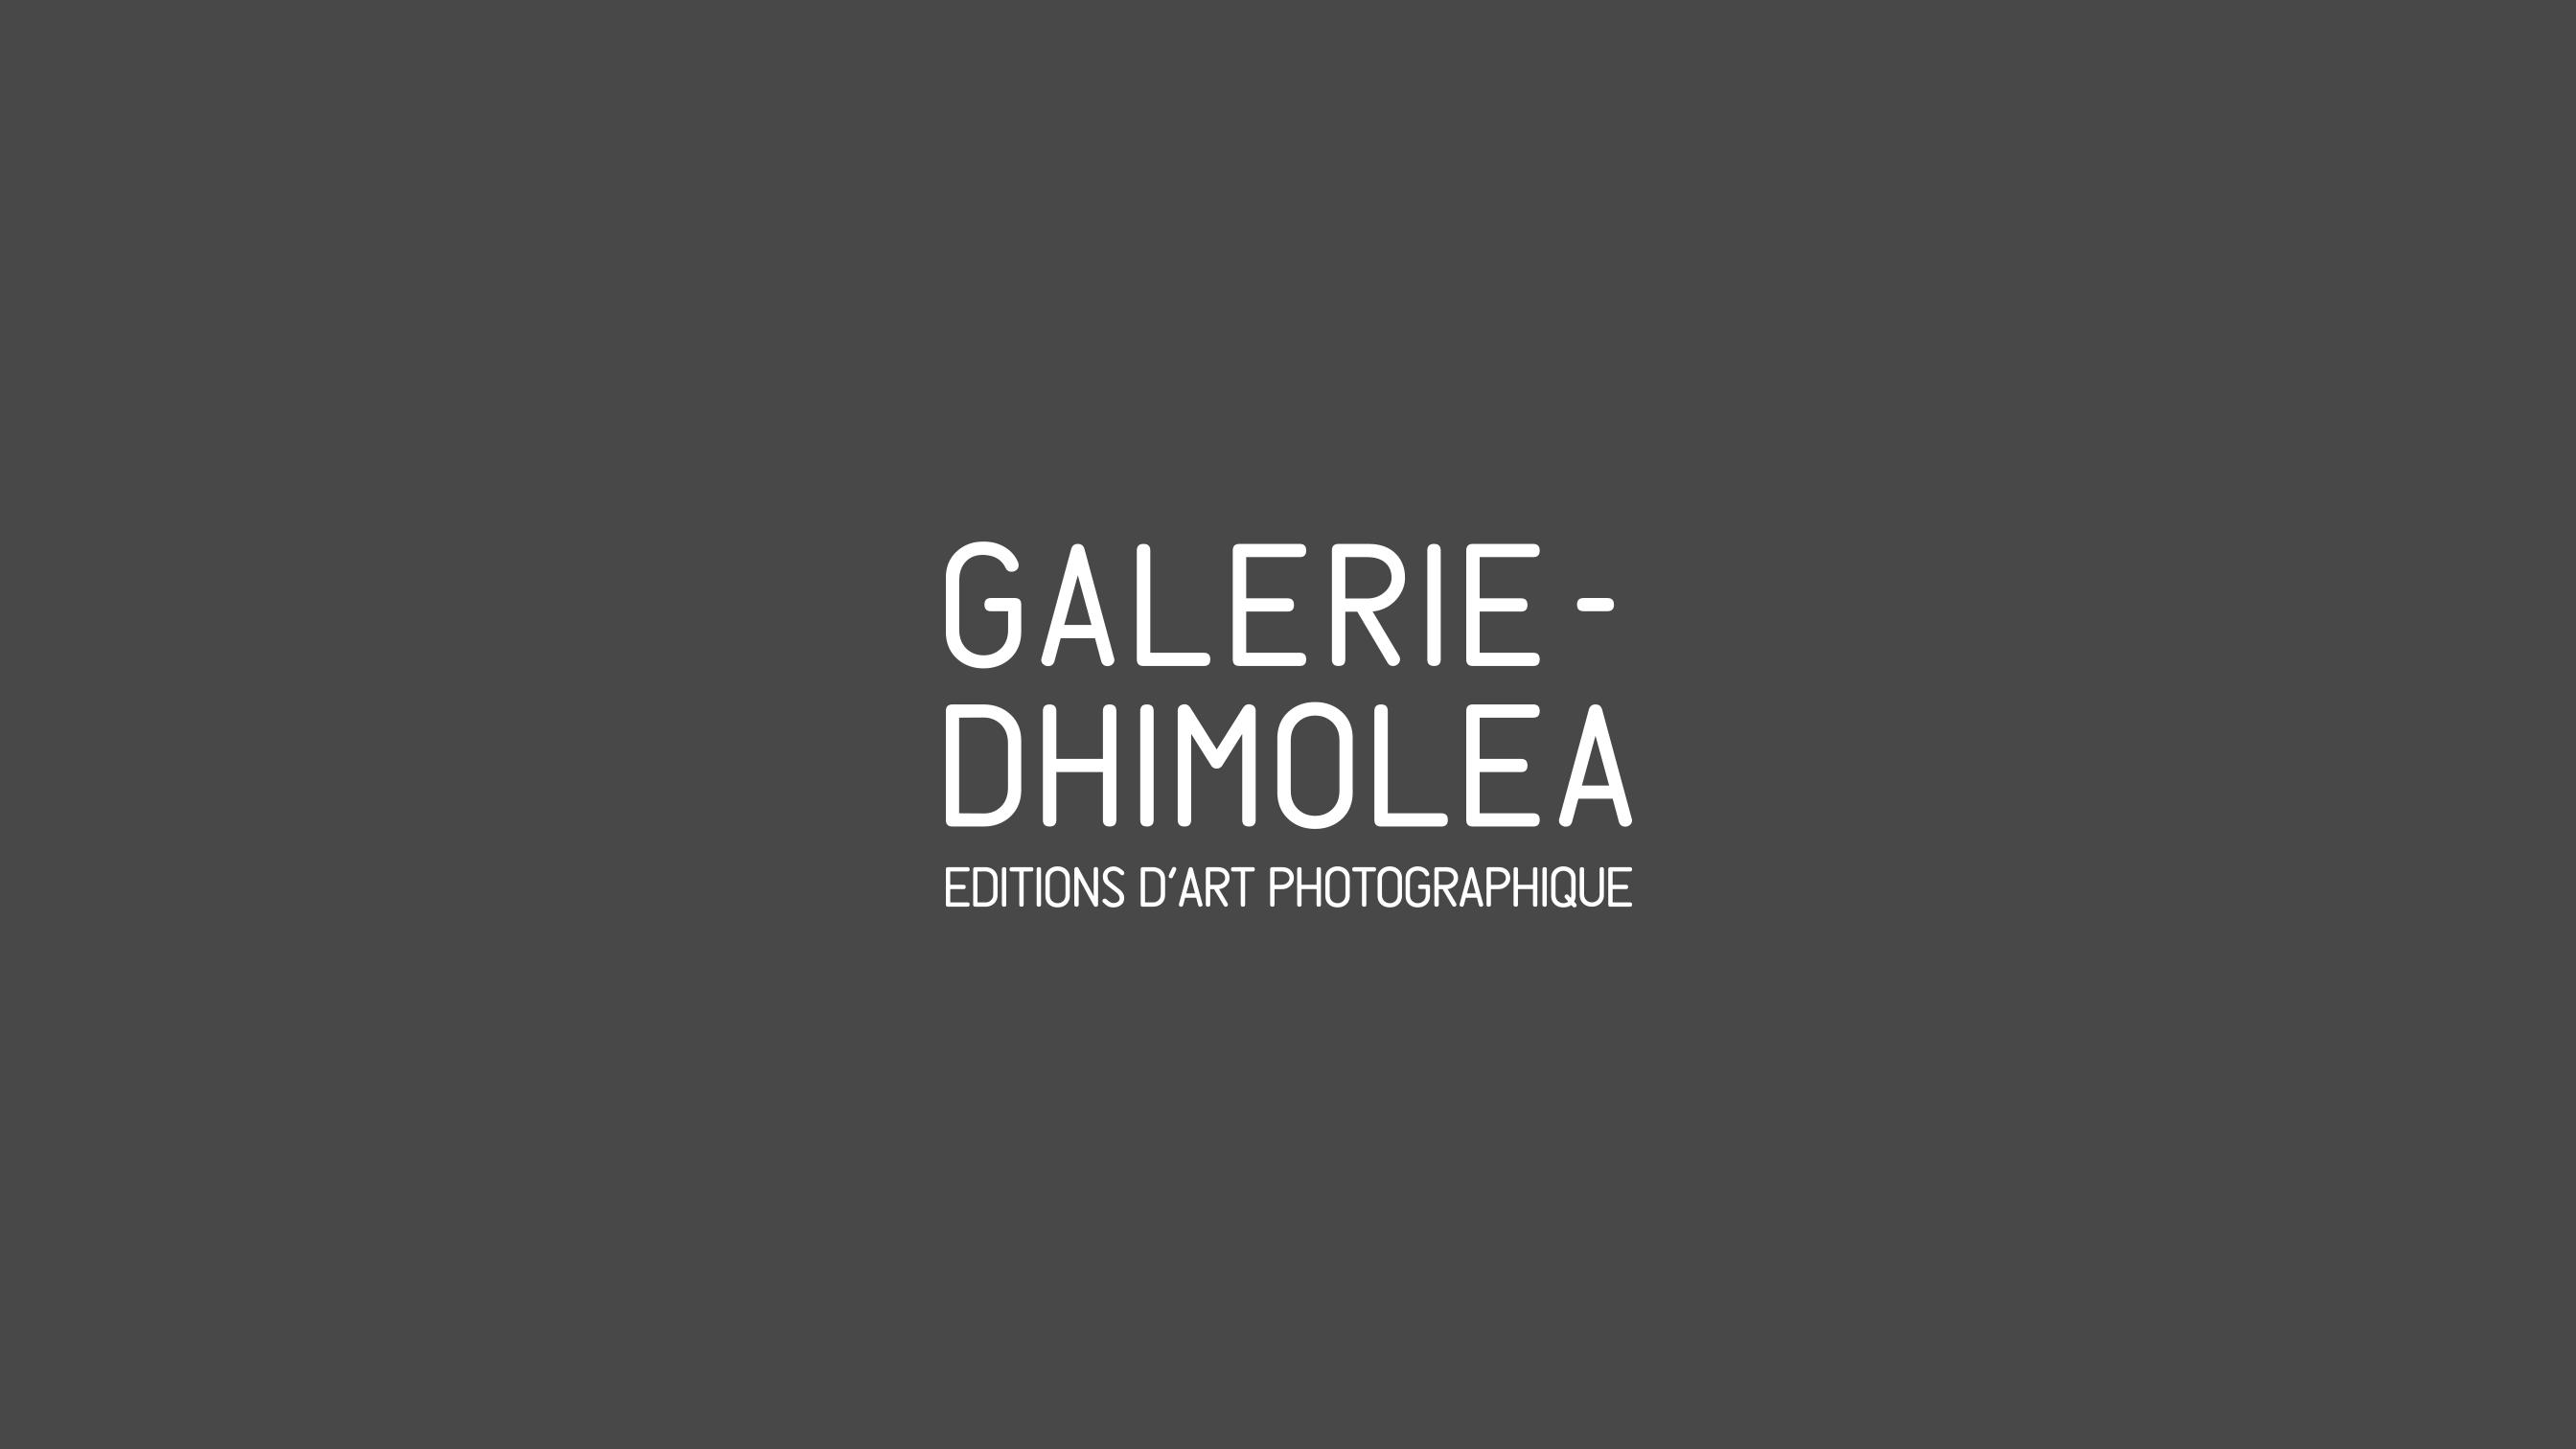 galeriedhimolea-logotype-pikteo